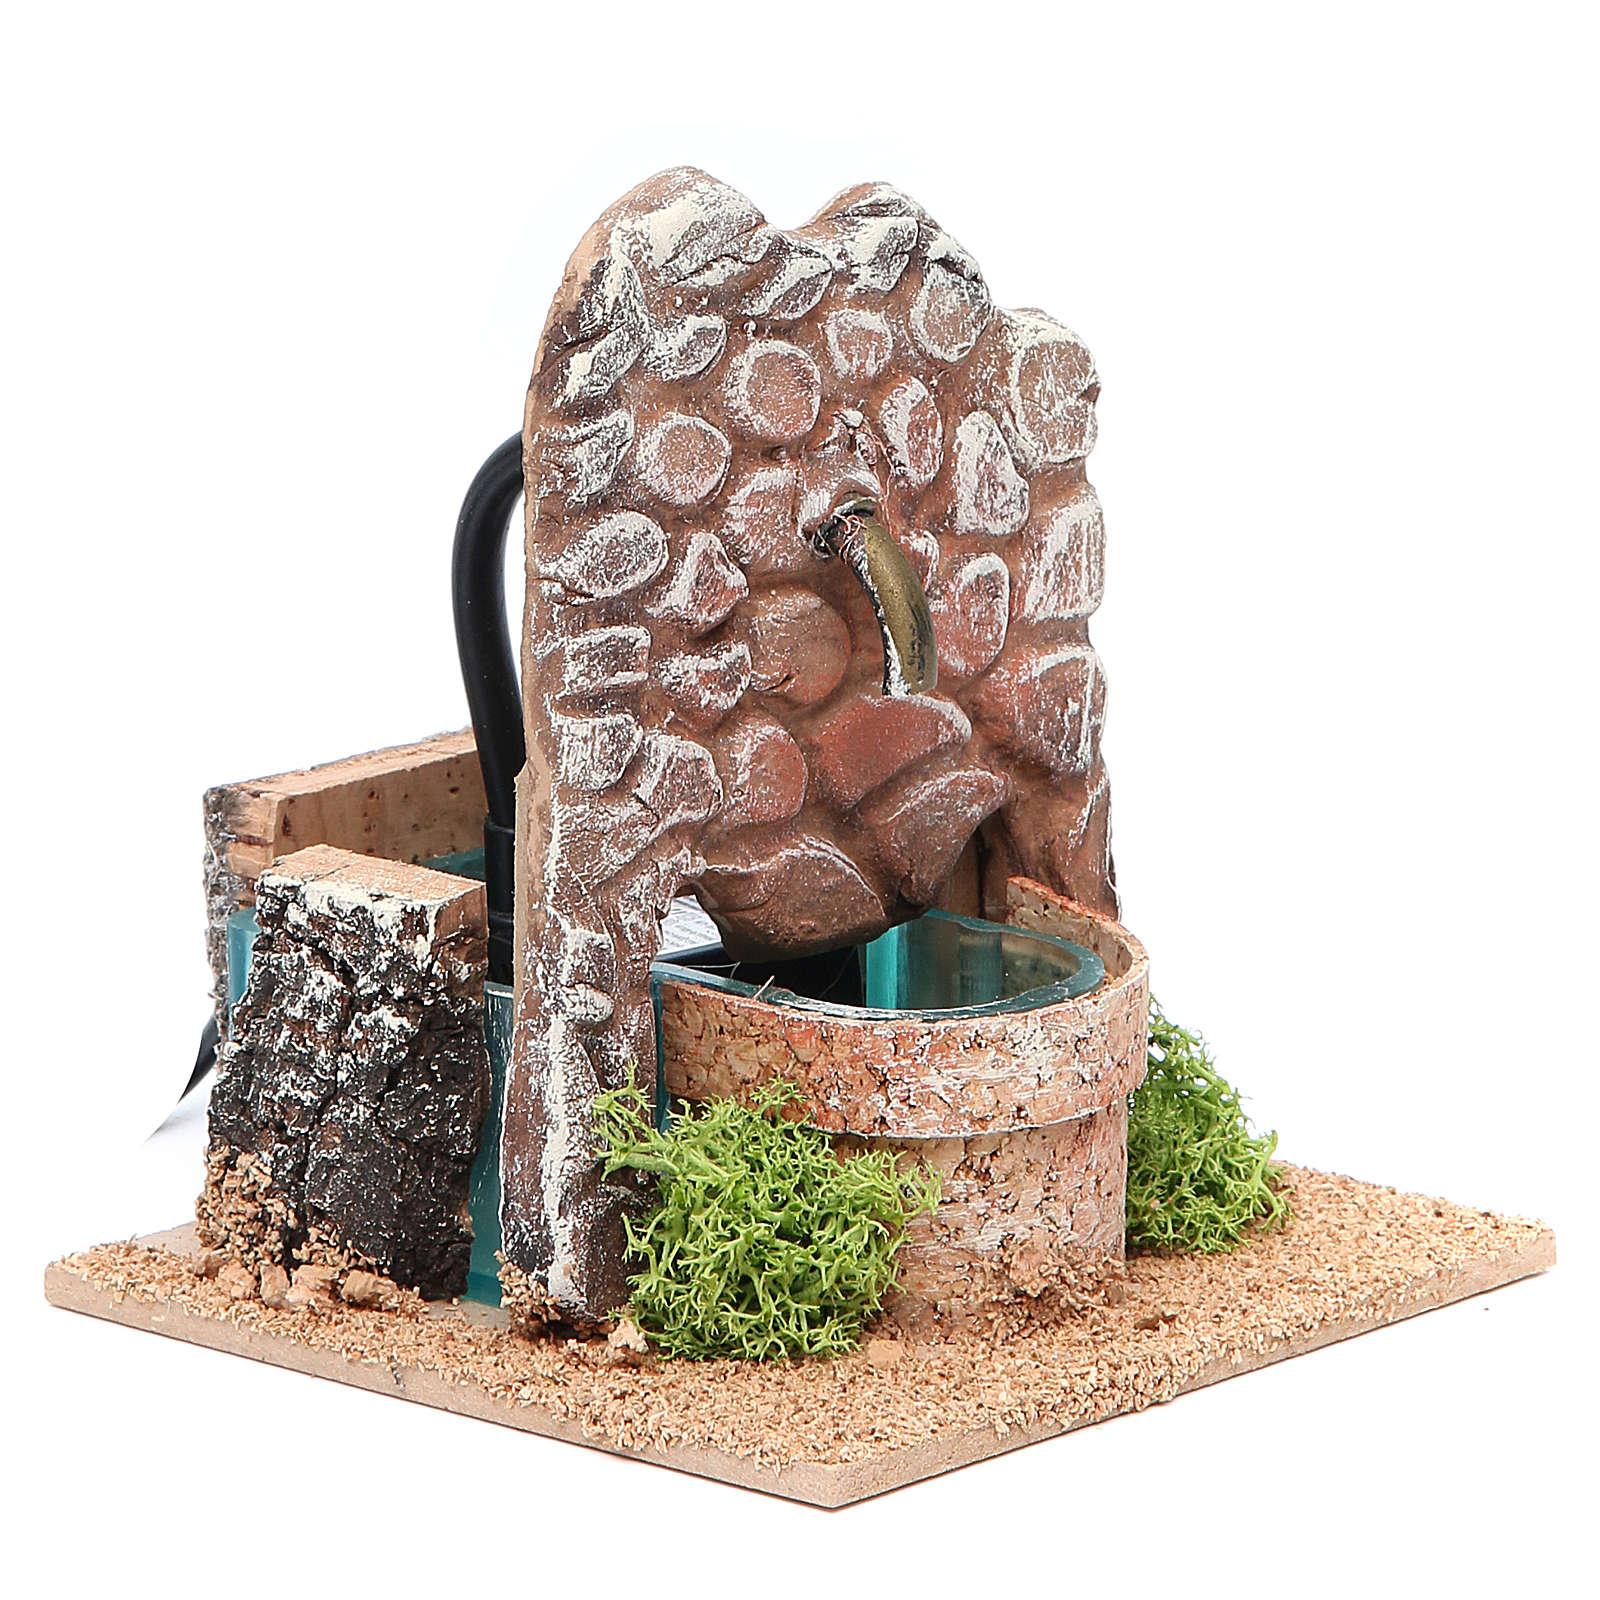 Fontana presepe in terracotta 13x12x12 cm 4